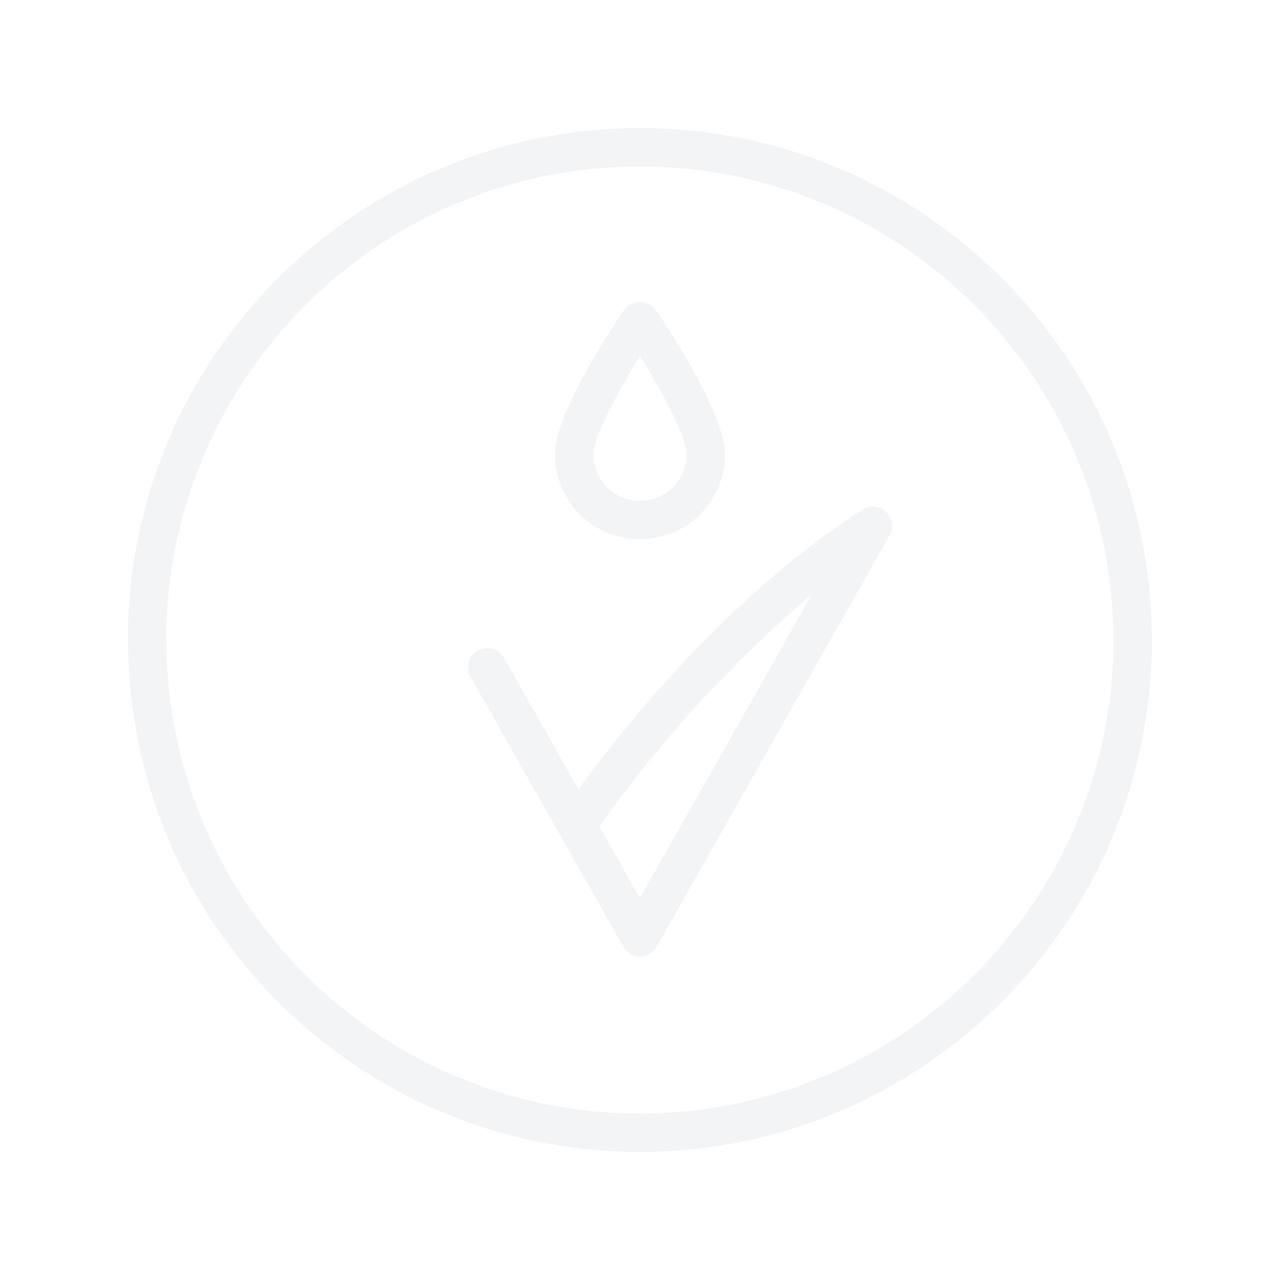 LUMENE Valo Glow Boost Essence (All Skins) 30ml